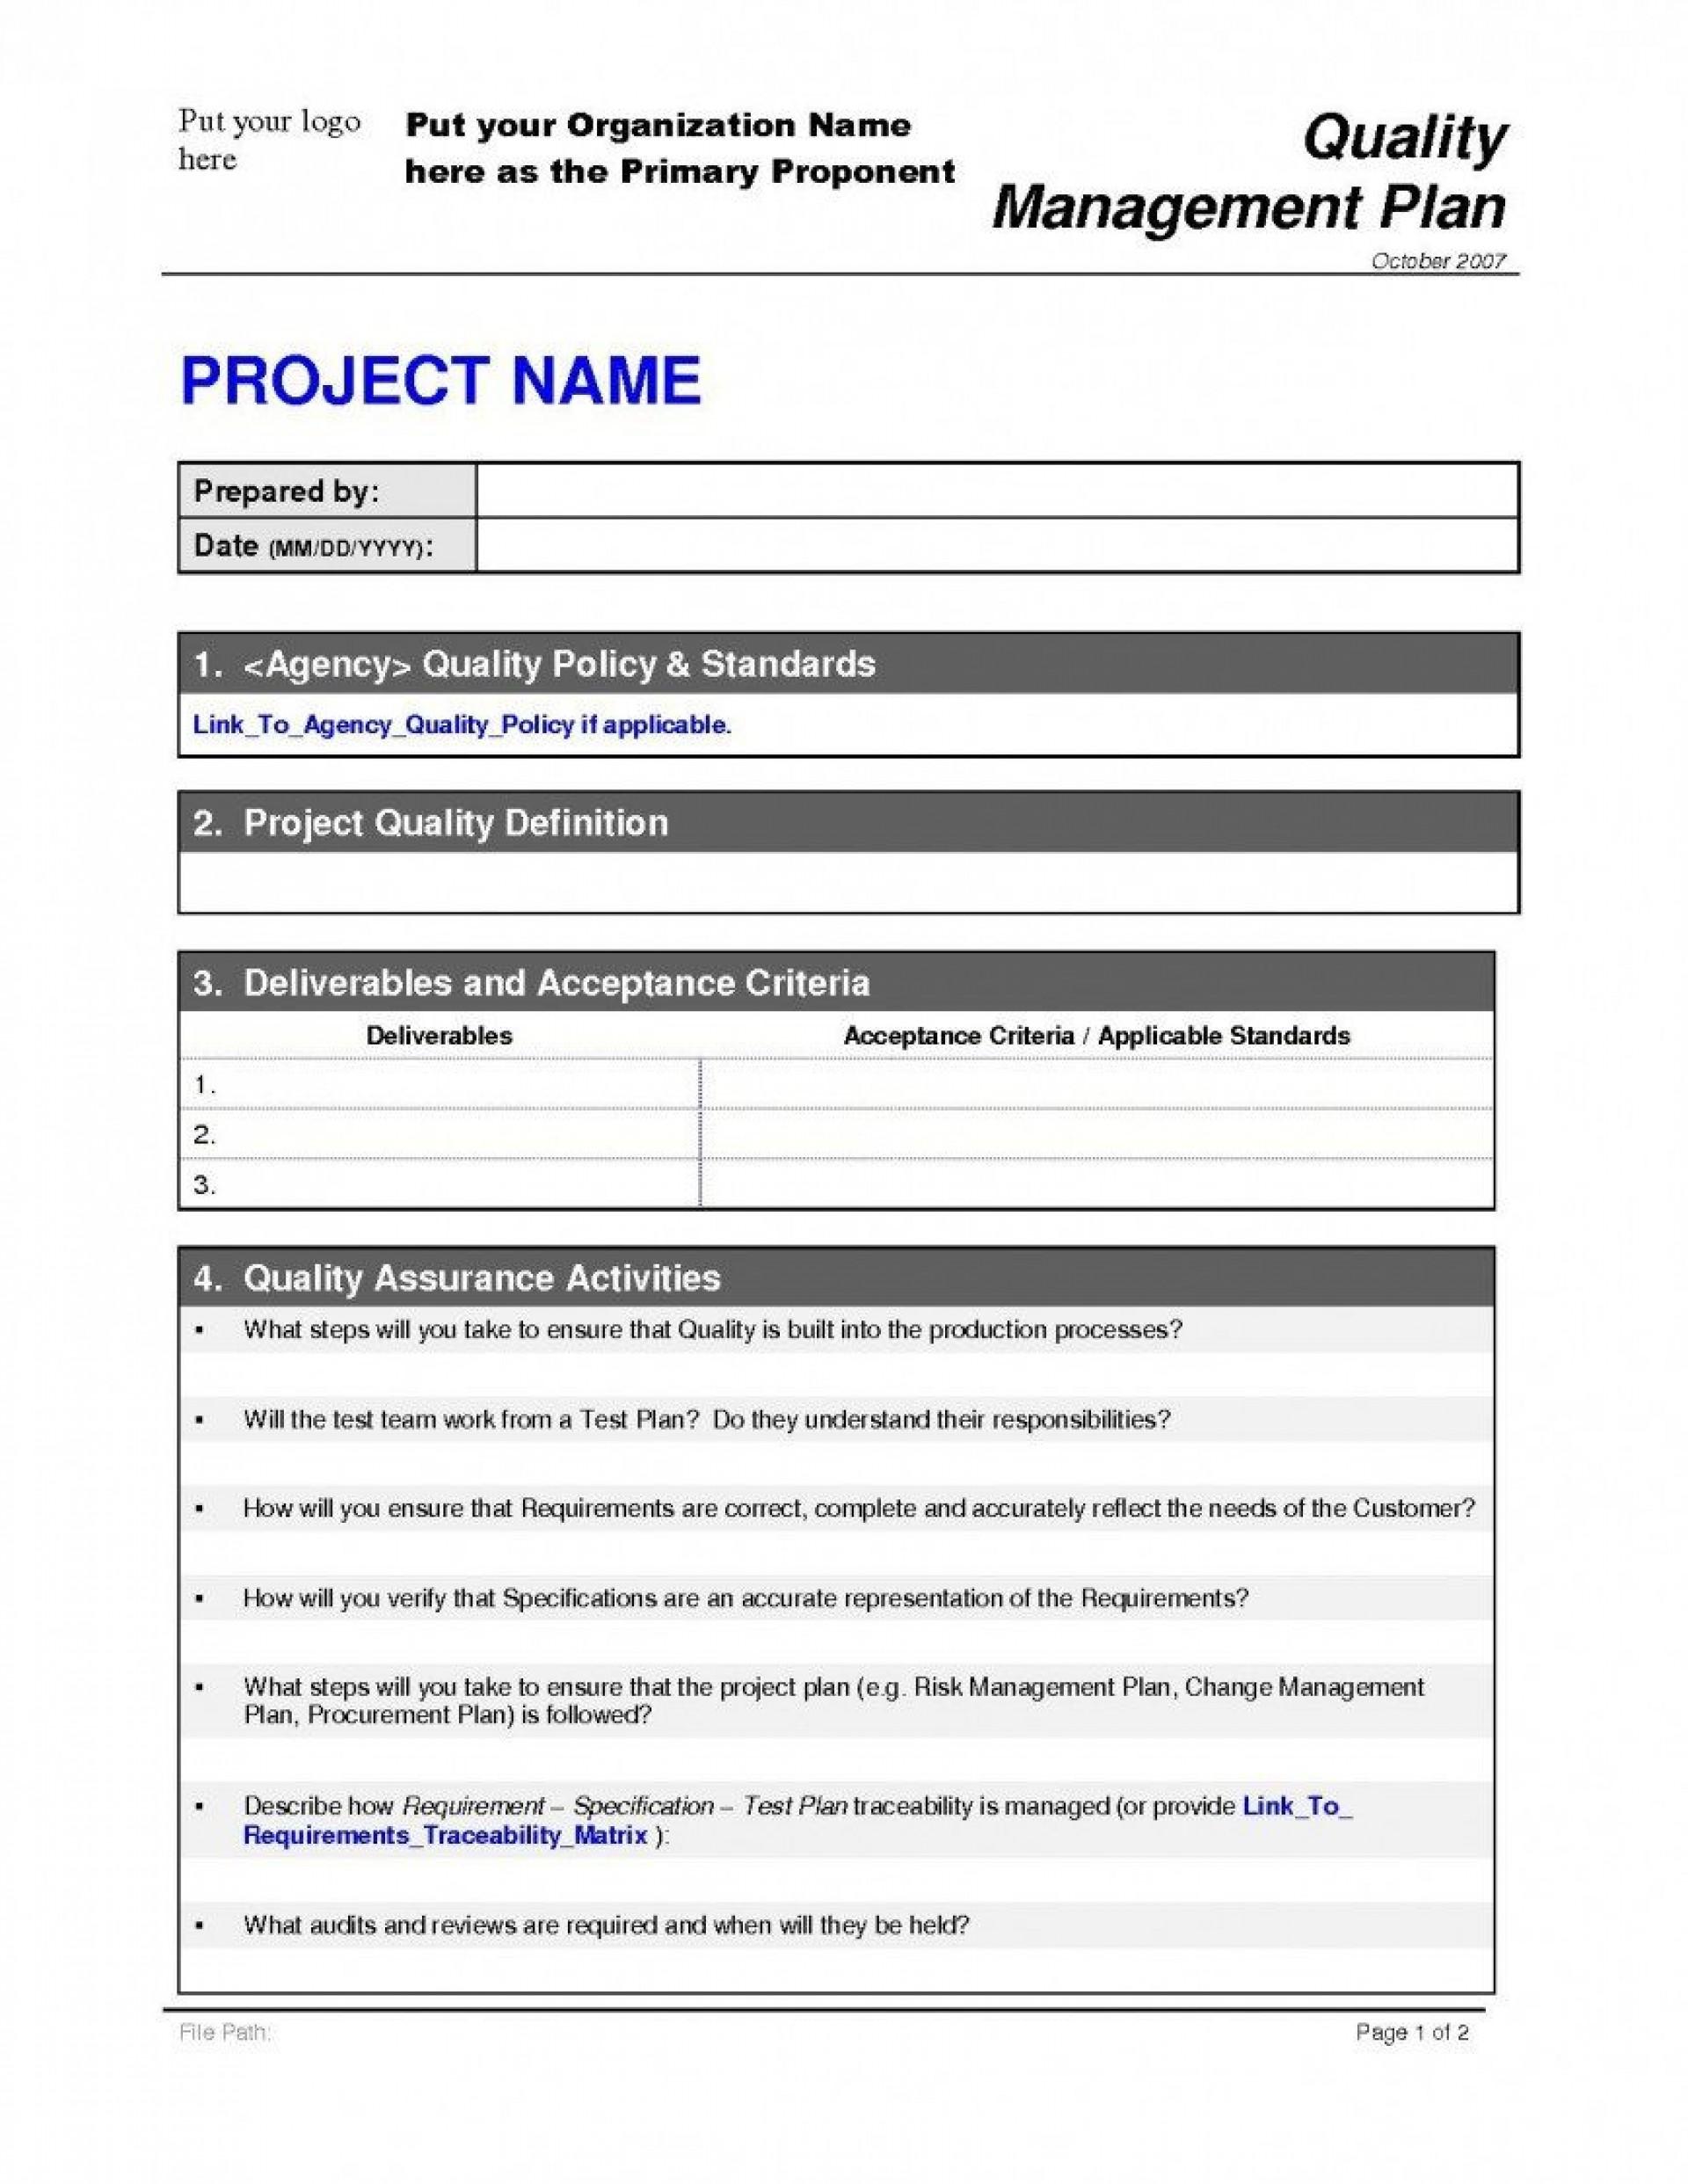 009 Surprising Project Management Plan Template Pmbok Photo  Example Pdf Pmi1920